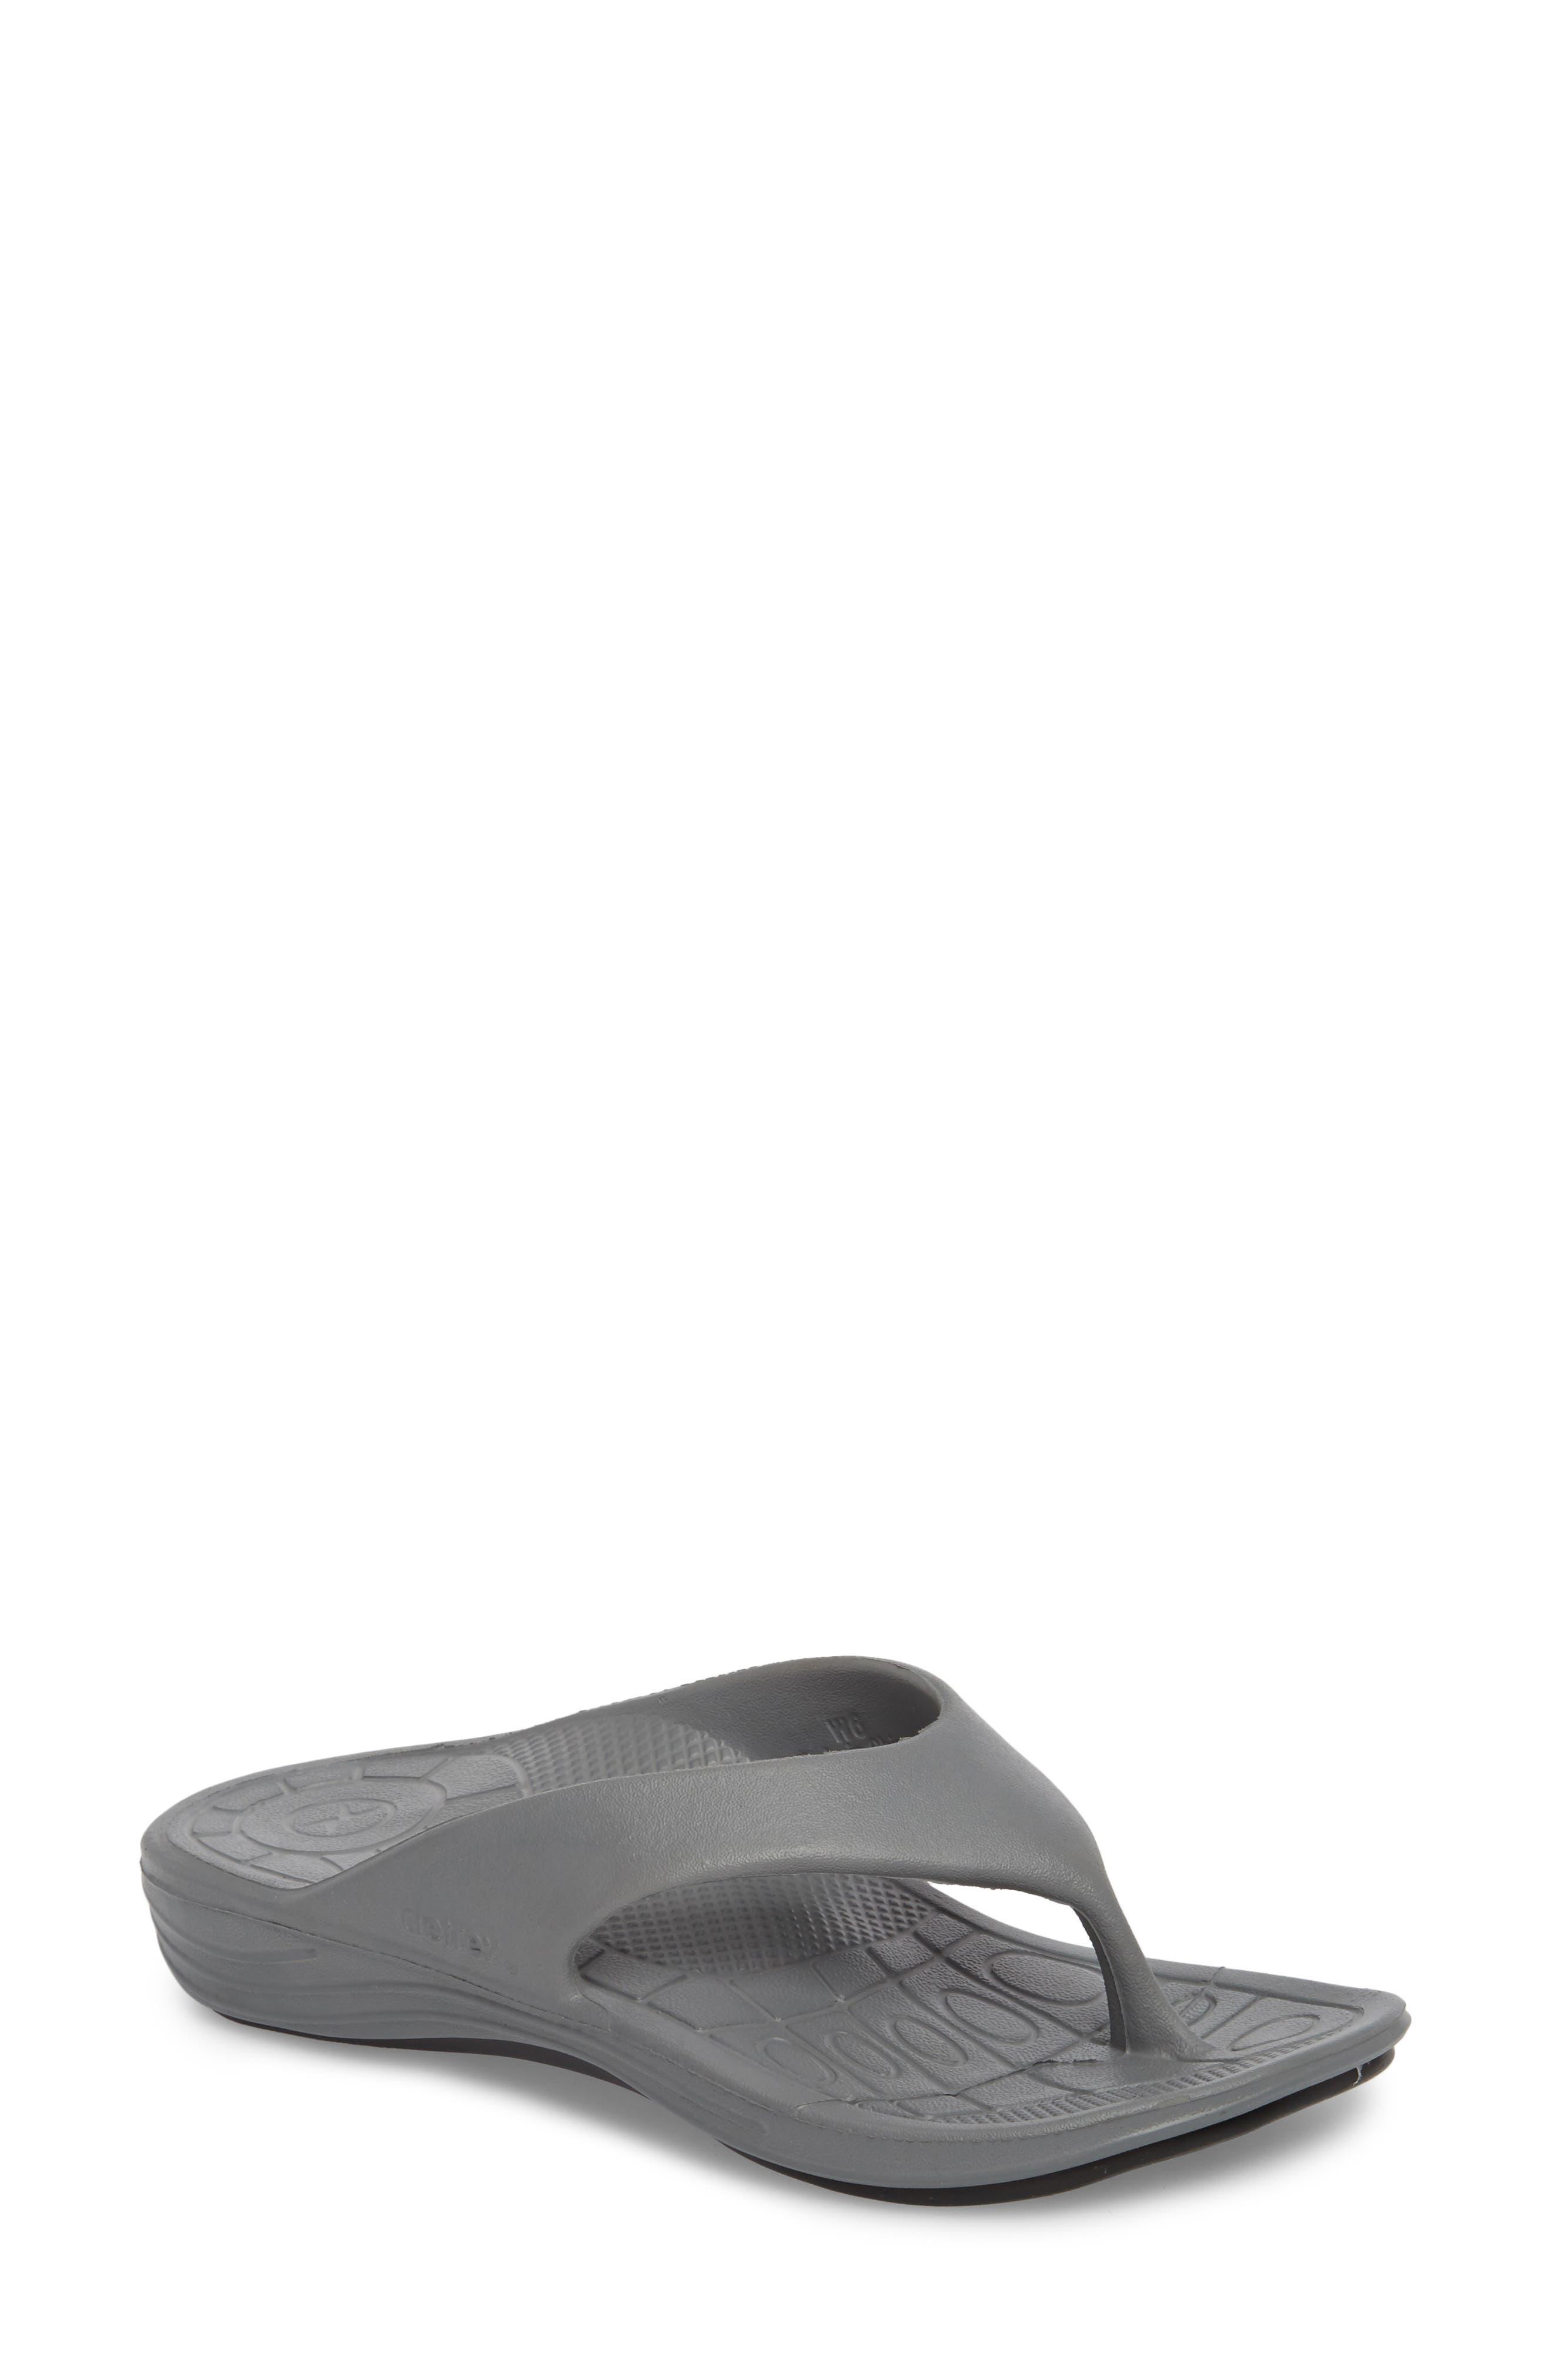 Lynco Flip Flop,                             Main thumbnail 1, color,                             GREY